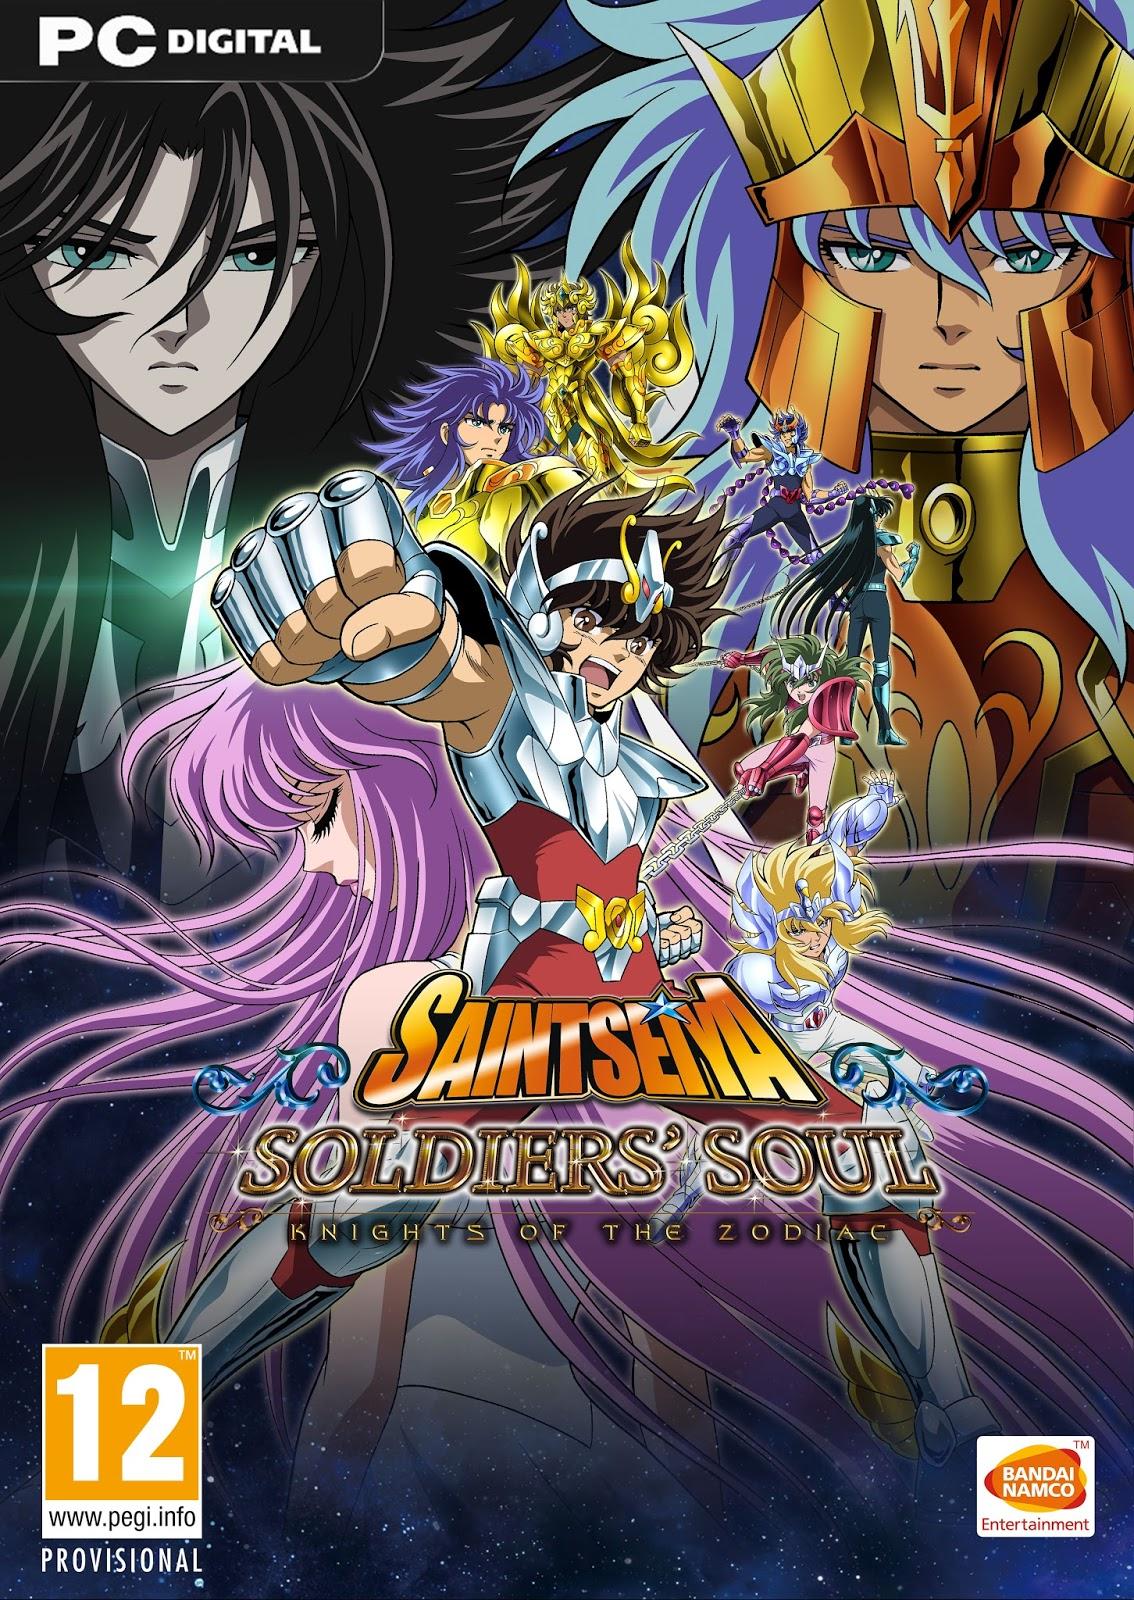 Saint Seiya Soldiers' Soul ESPAÑOL PC Full Cover Caratula